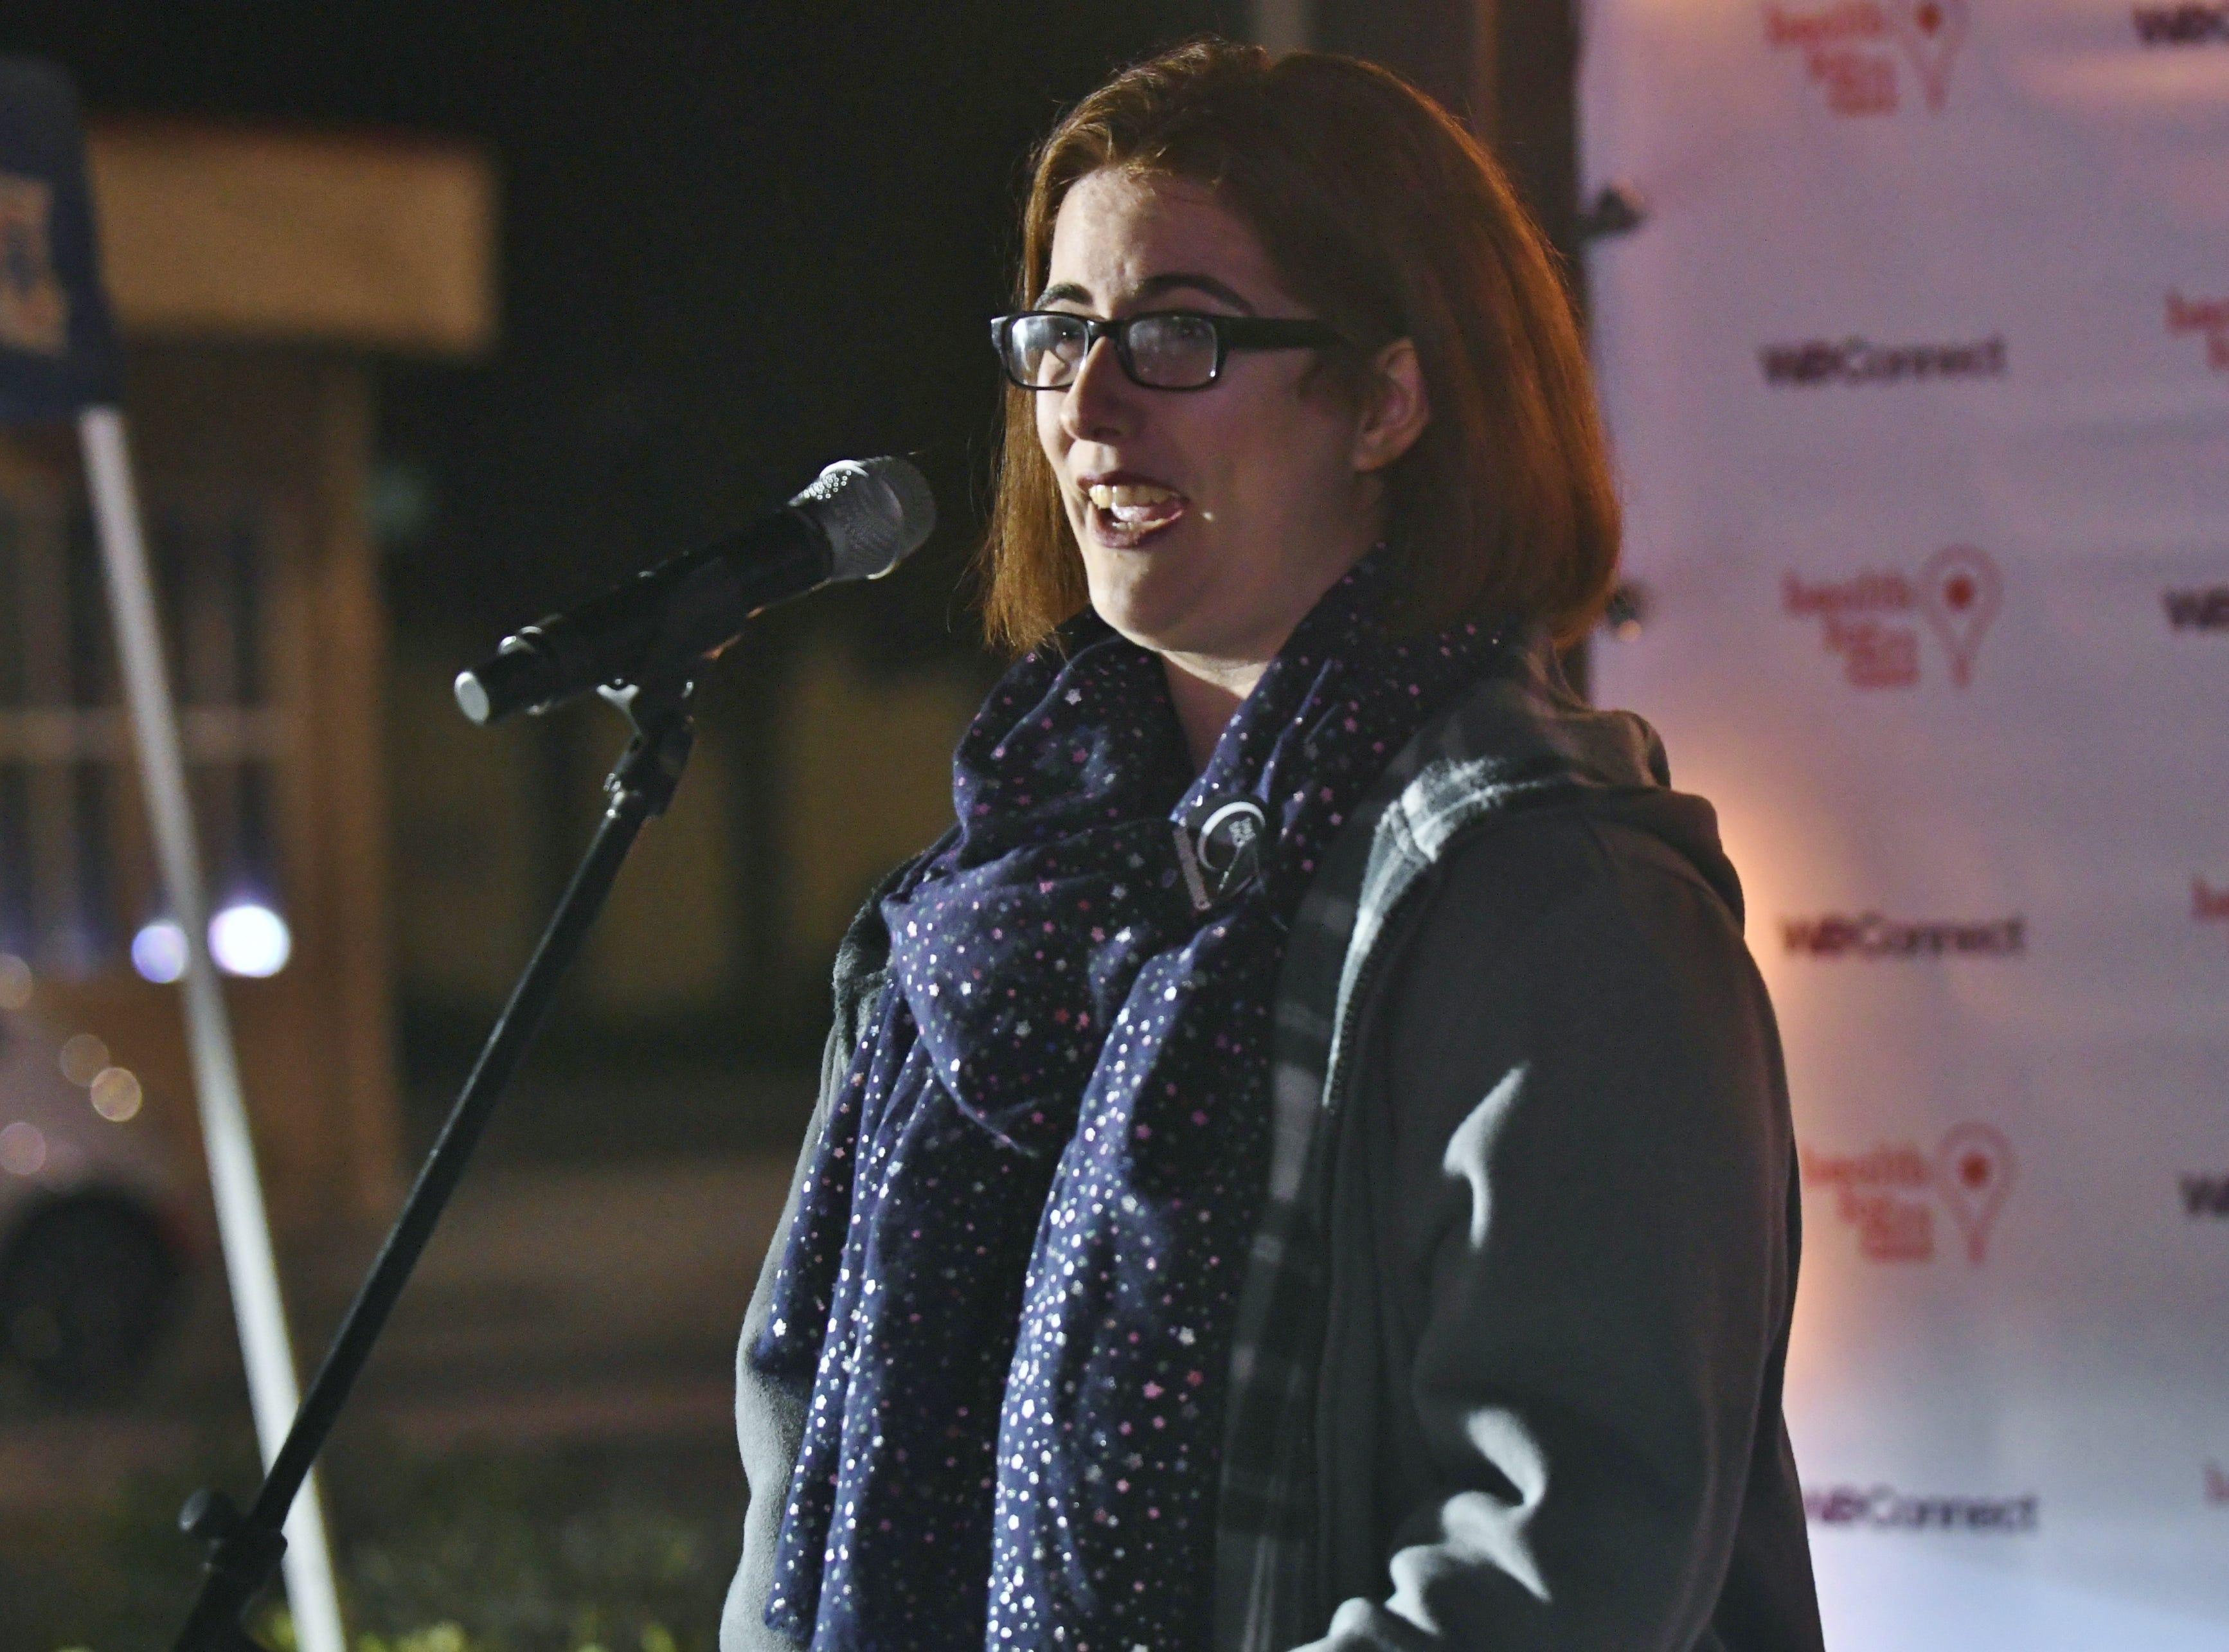 Brooke Mateus performed slam poetry during Visalia's Take Back the Night on Thursday.